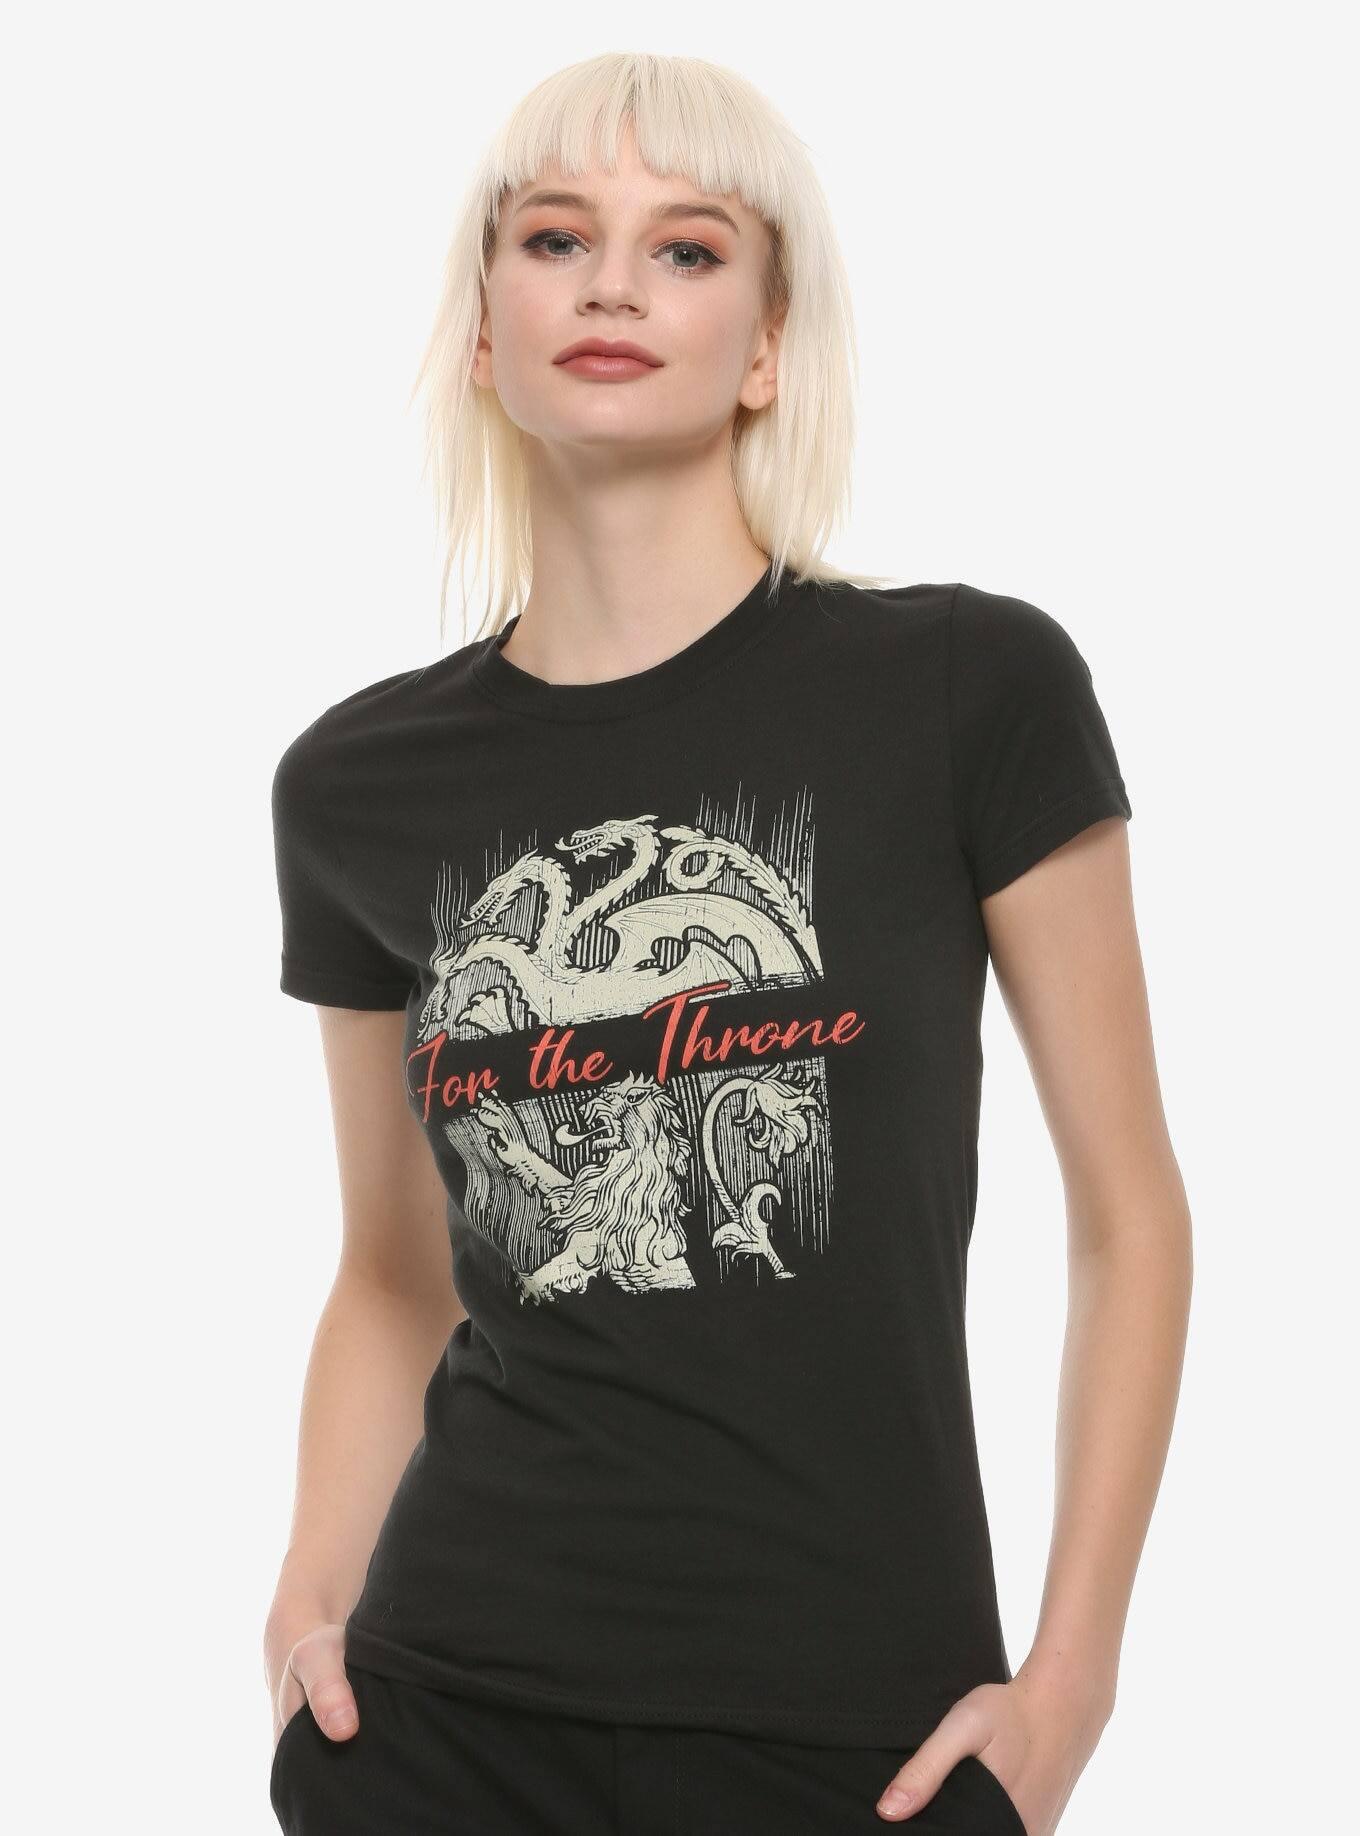 Hot Topic Men's & Women's Graphic Tees (Marvel, Music, Star Wars & More)